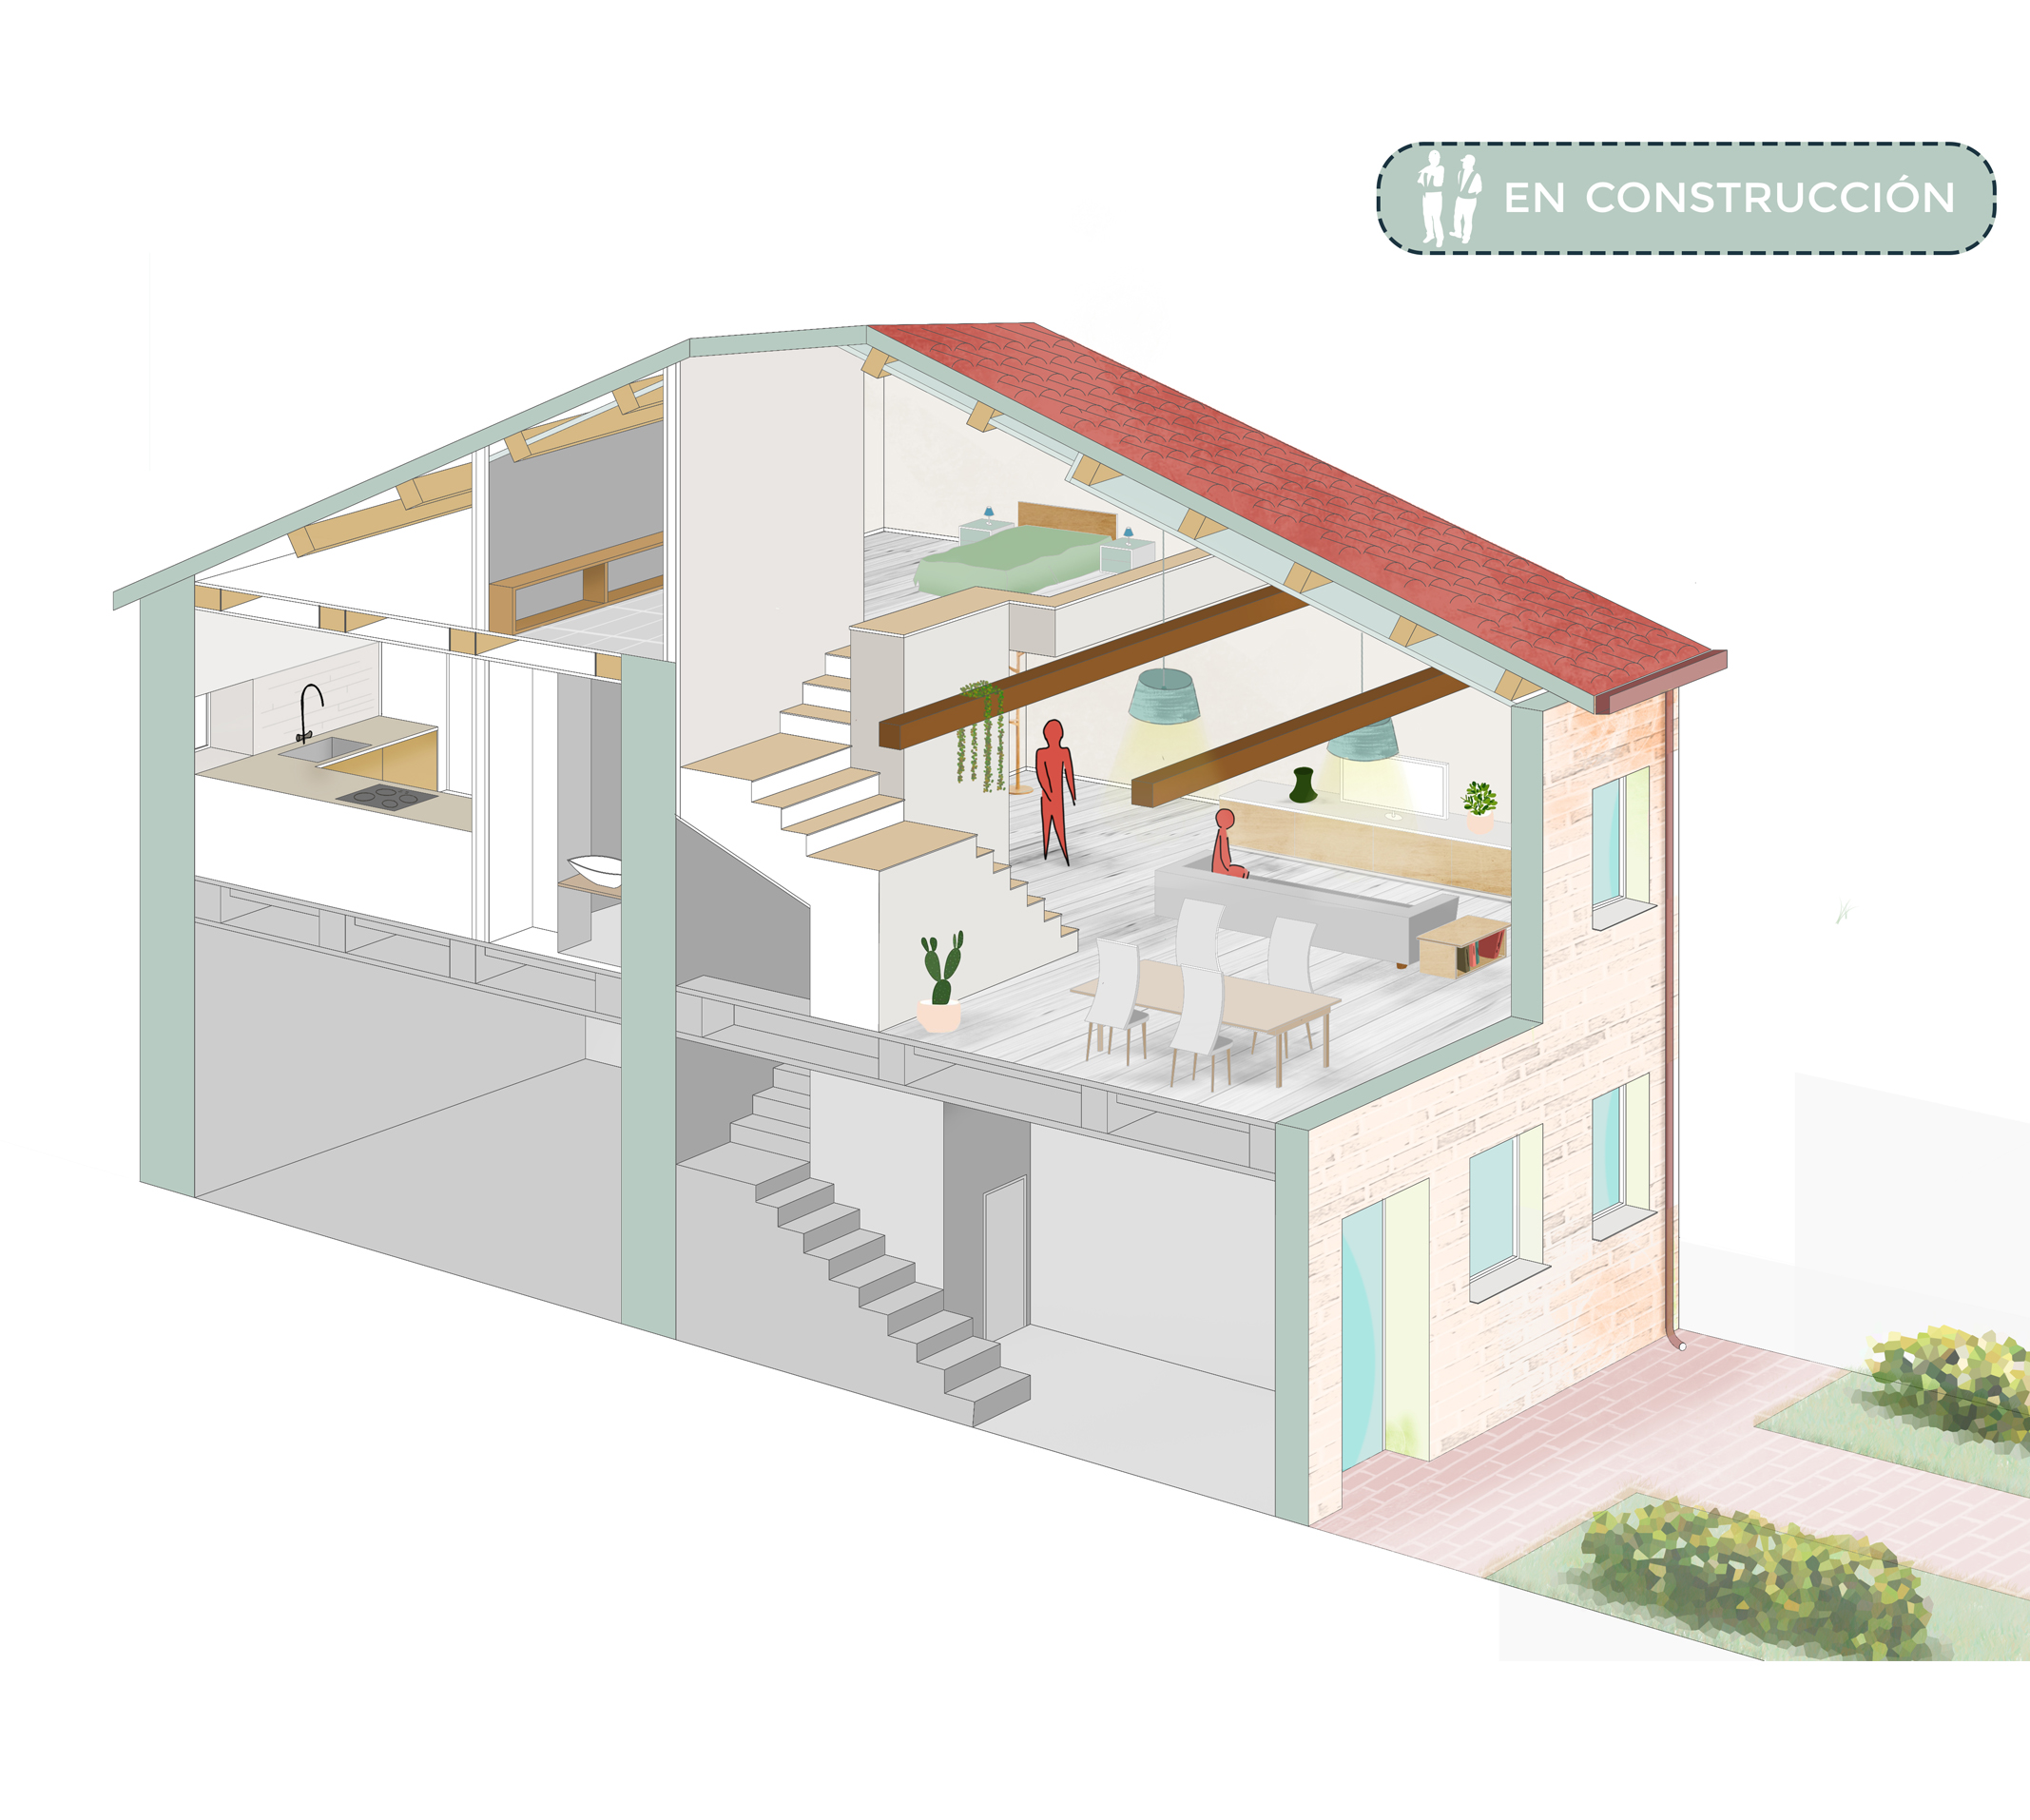 Casa_S_persearquitectura